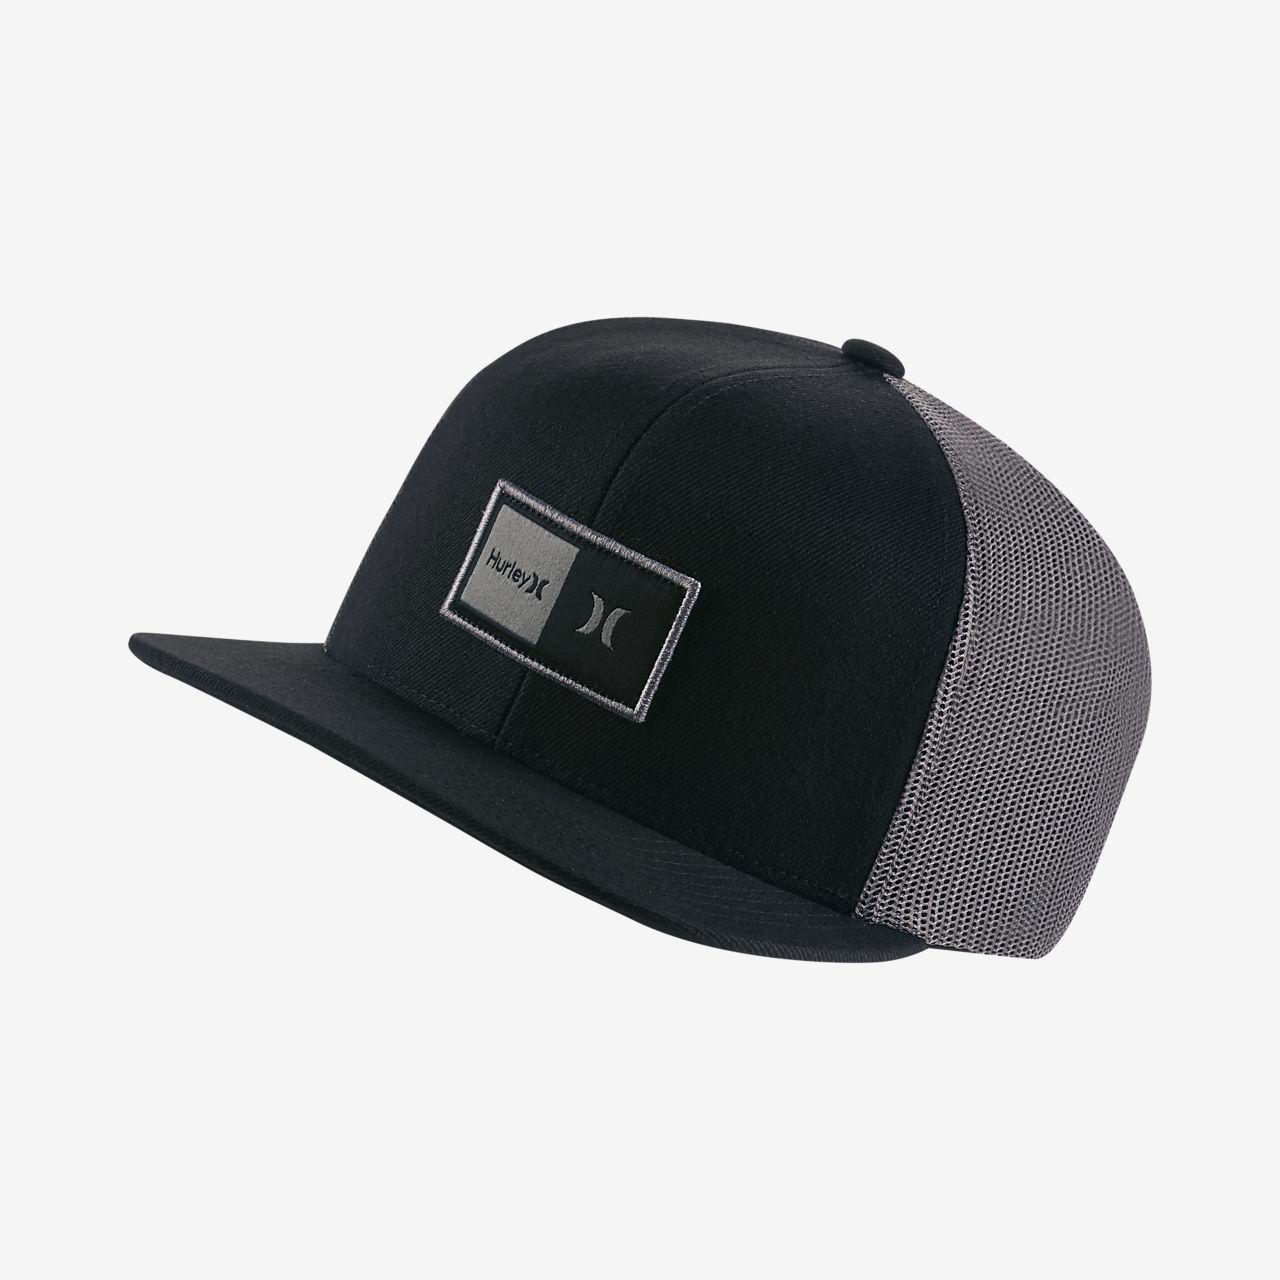 Hurley Natural Men's Hat